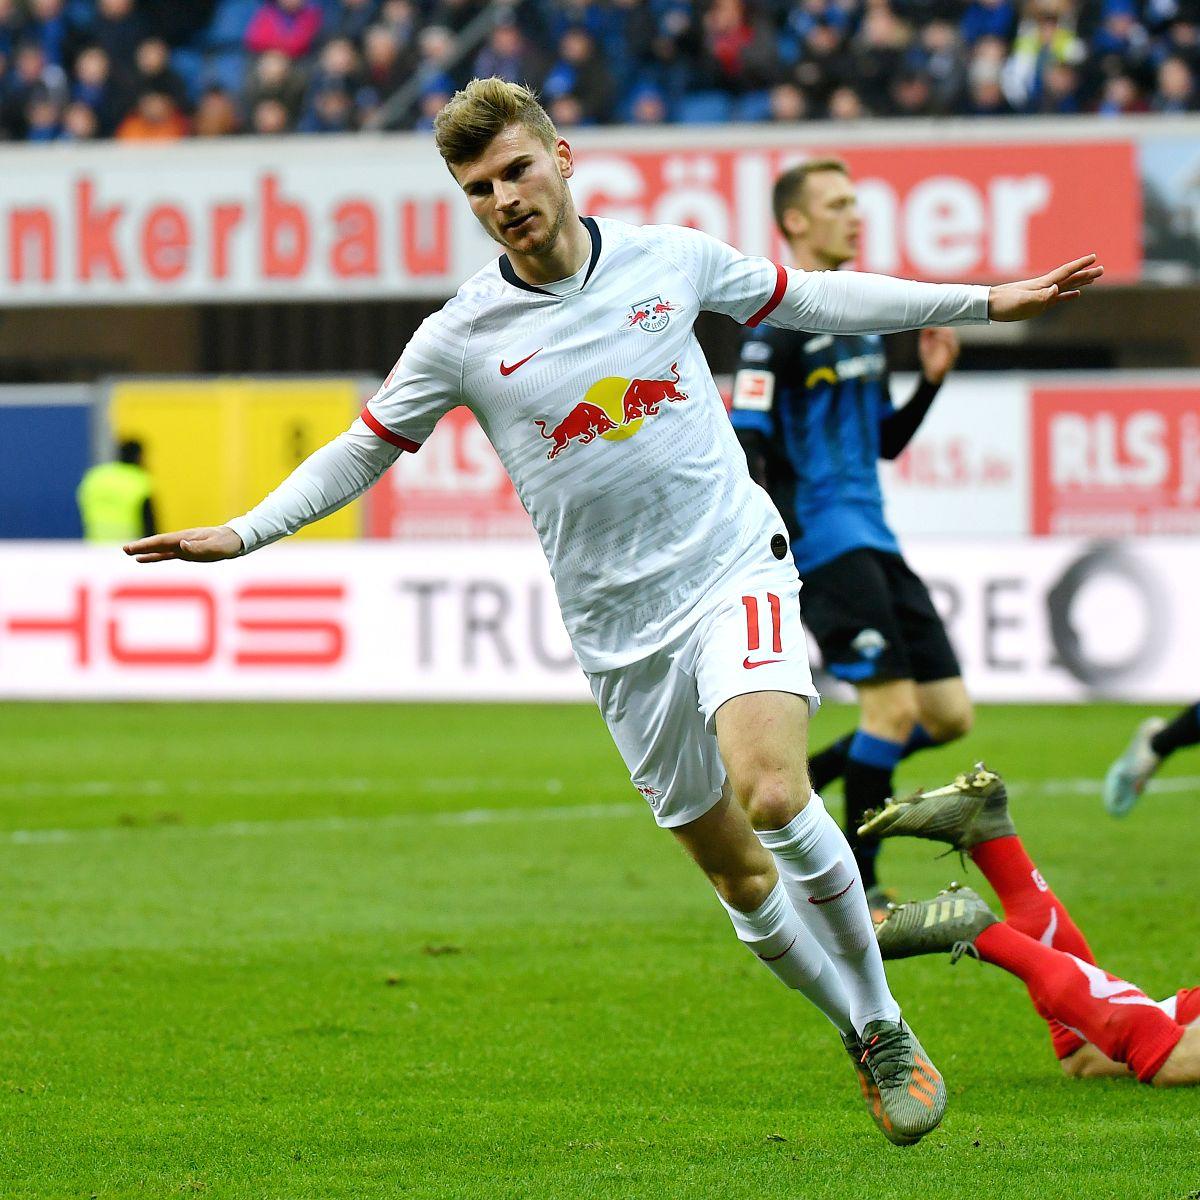 Werner on target as Leipzig beat Cologne in Bundesliga